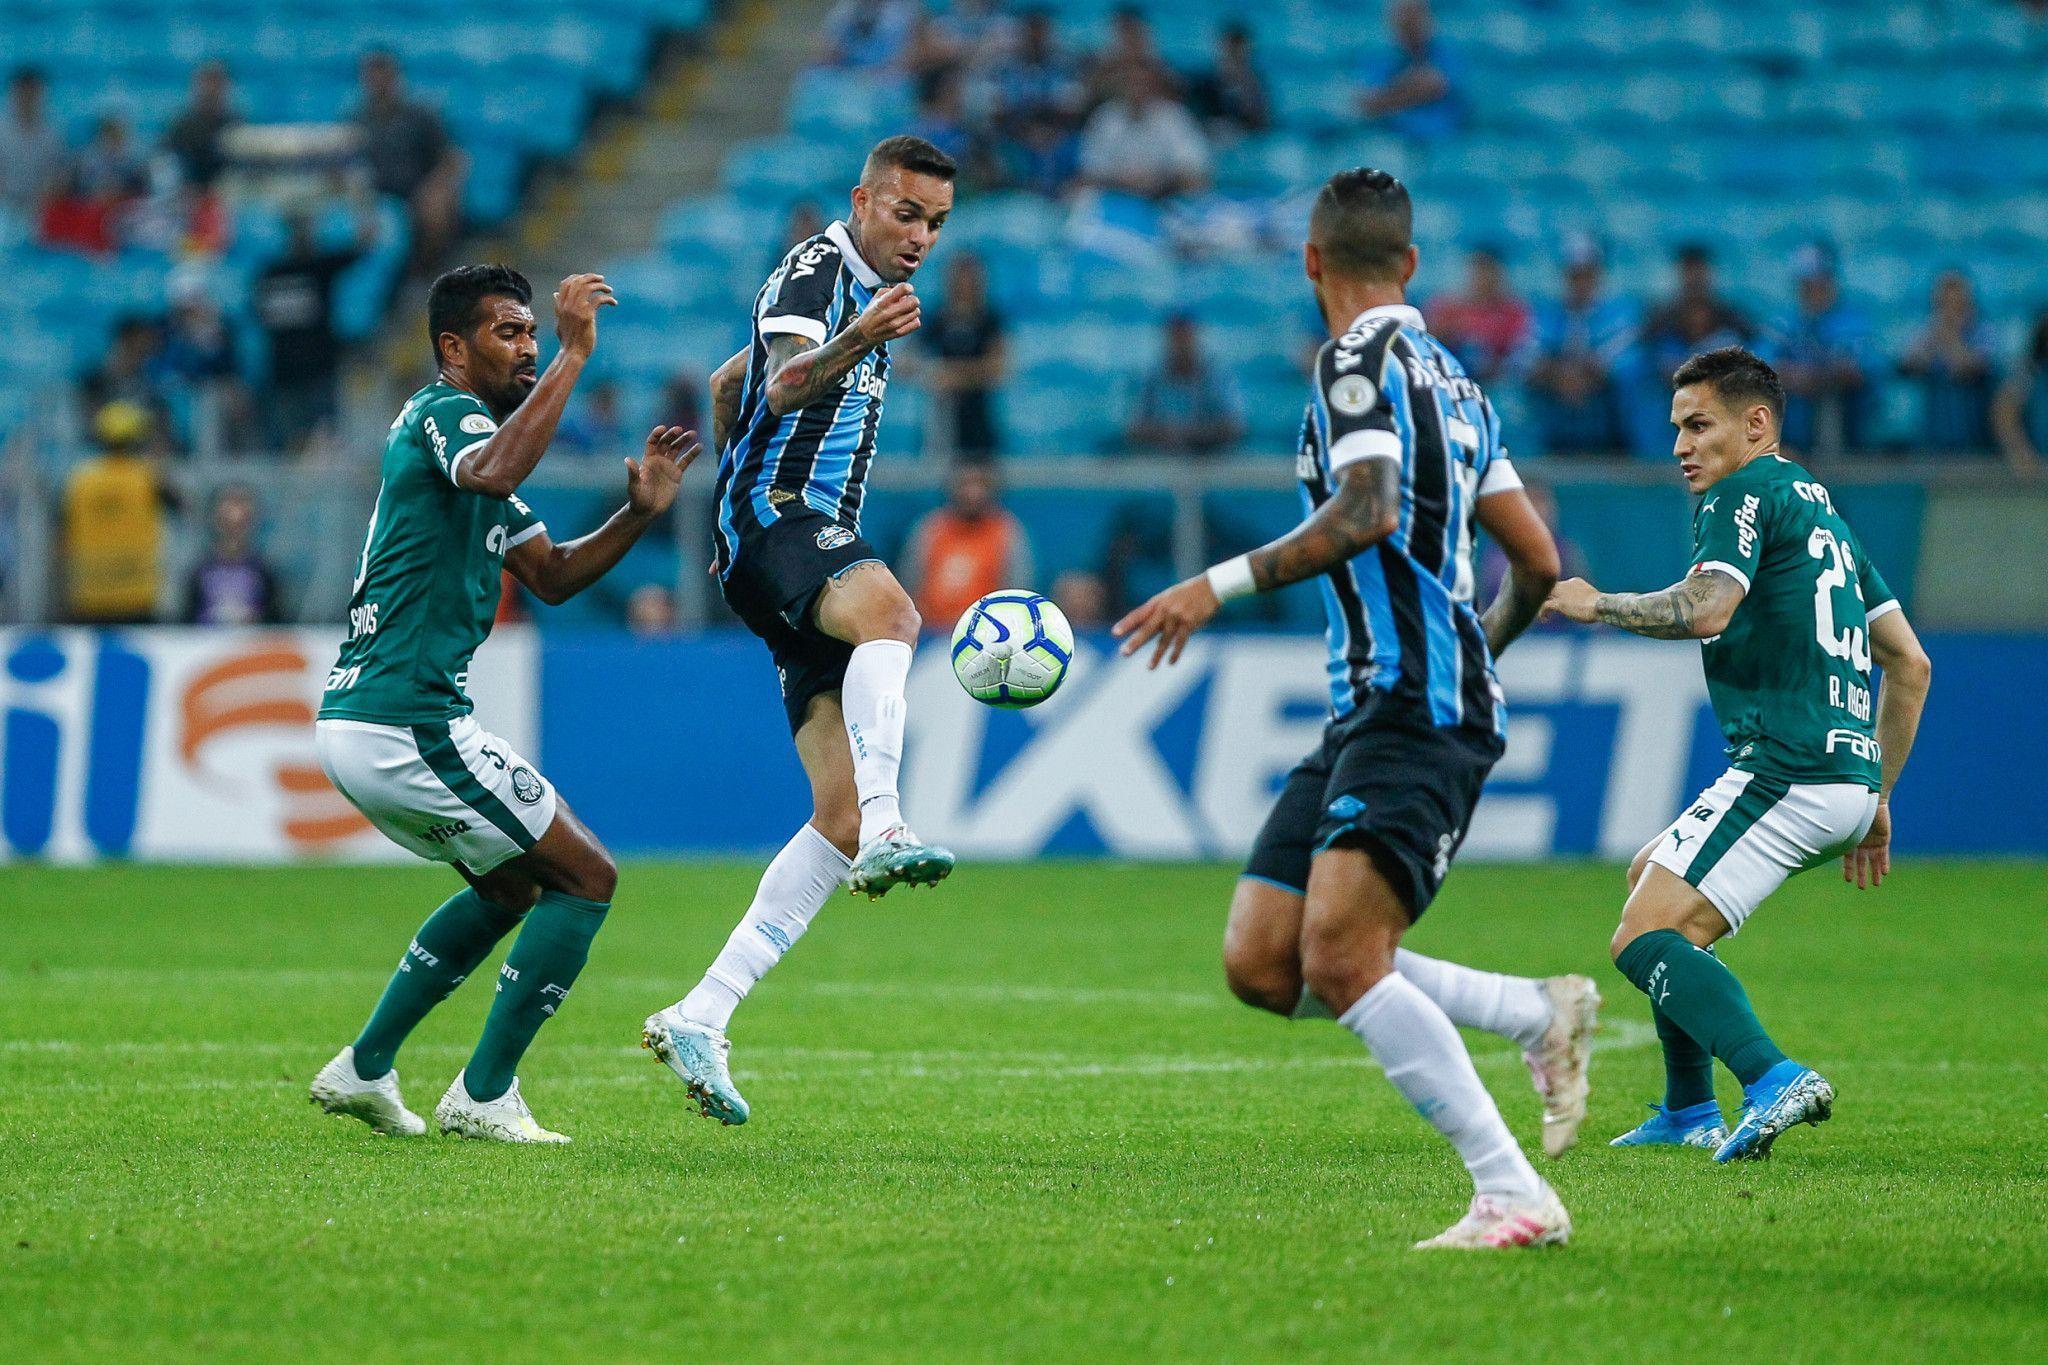 Jogo do Grêmio ao vivo: veja onde assistir Grêmio x ...